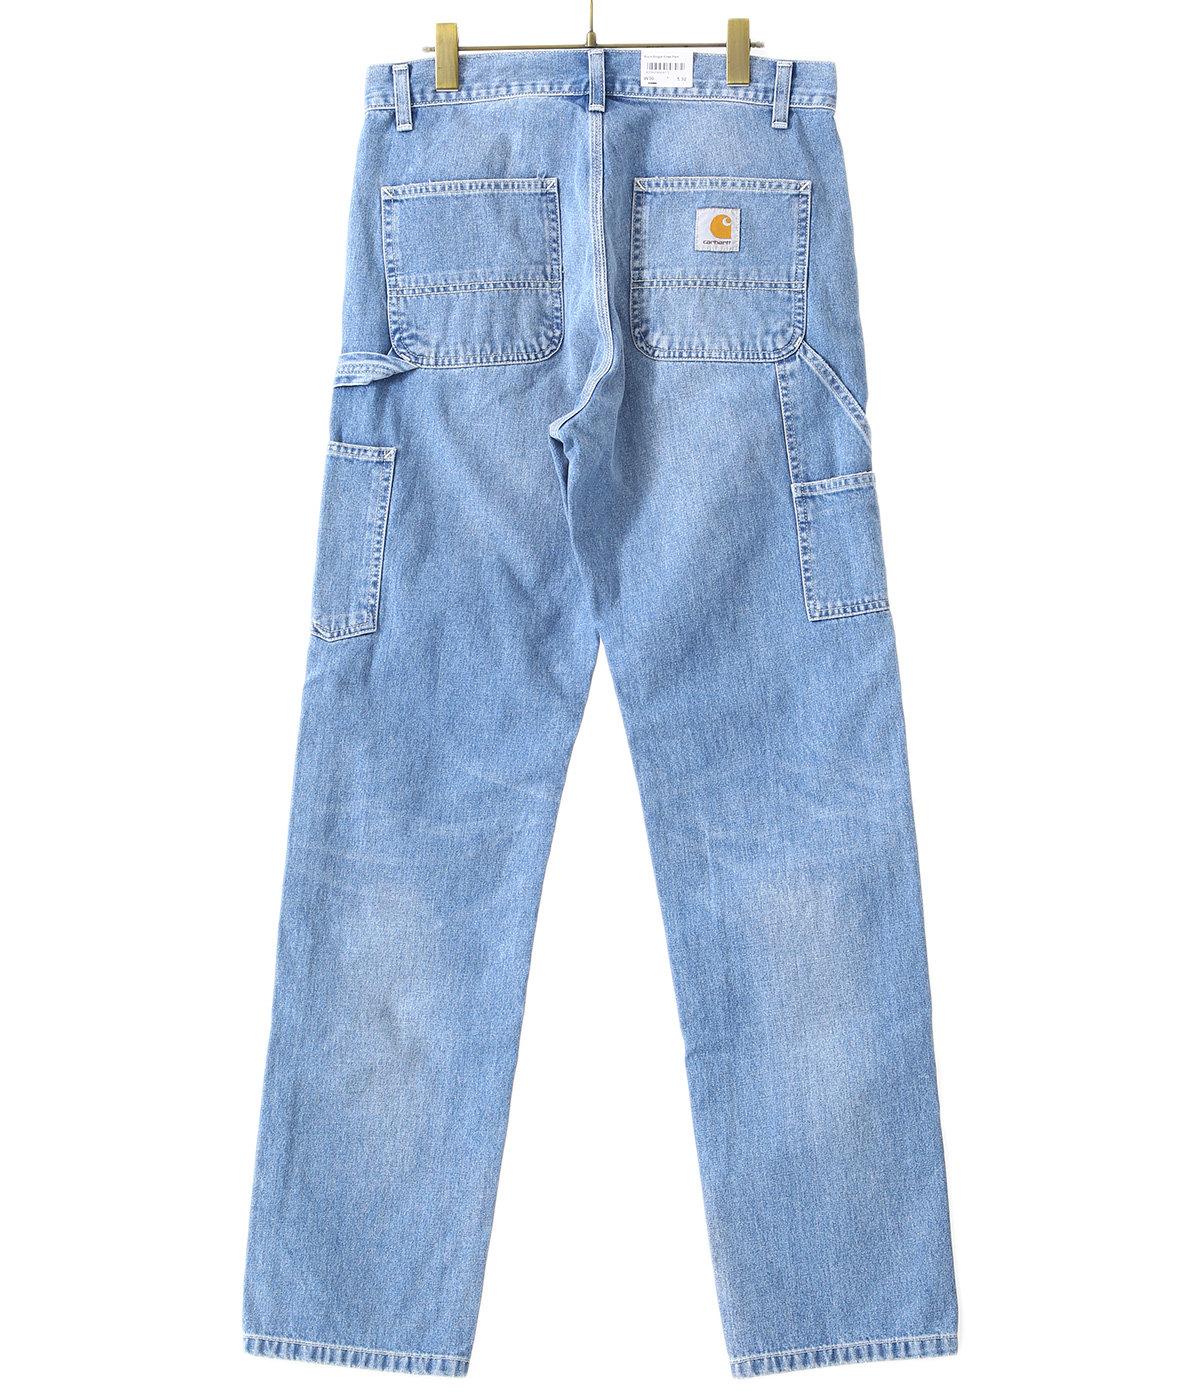 RUCK SINGLE KNEE PANT(Blue worn bleached)